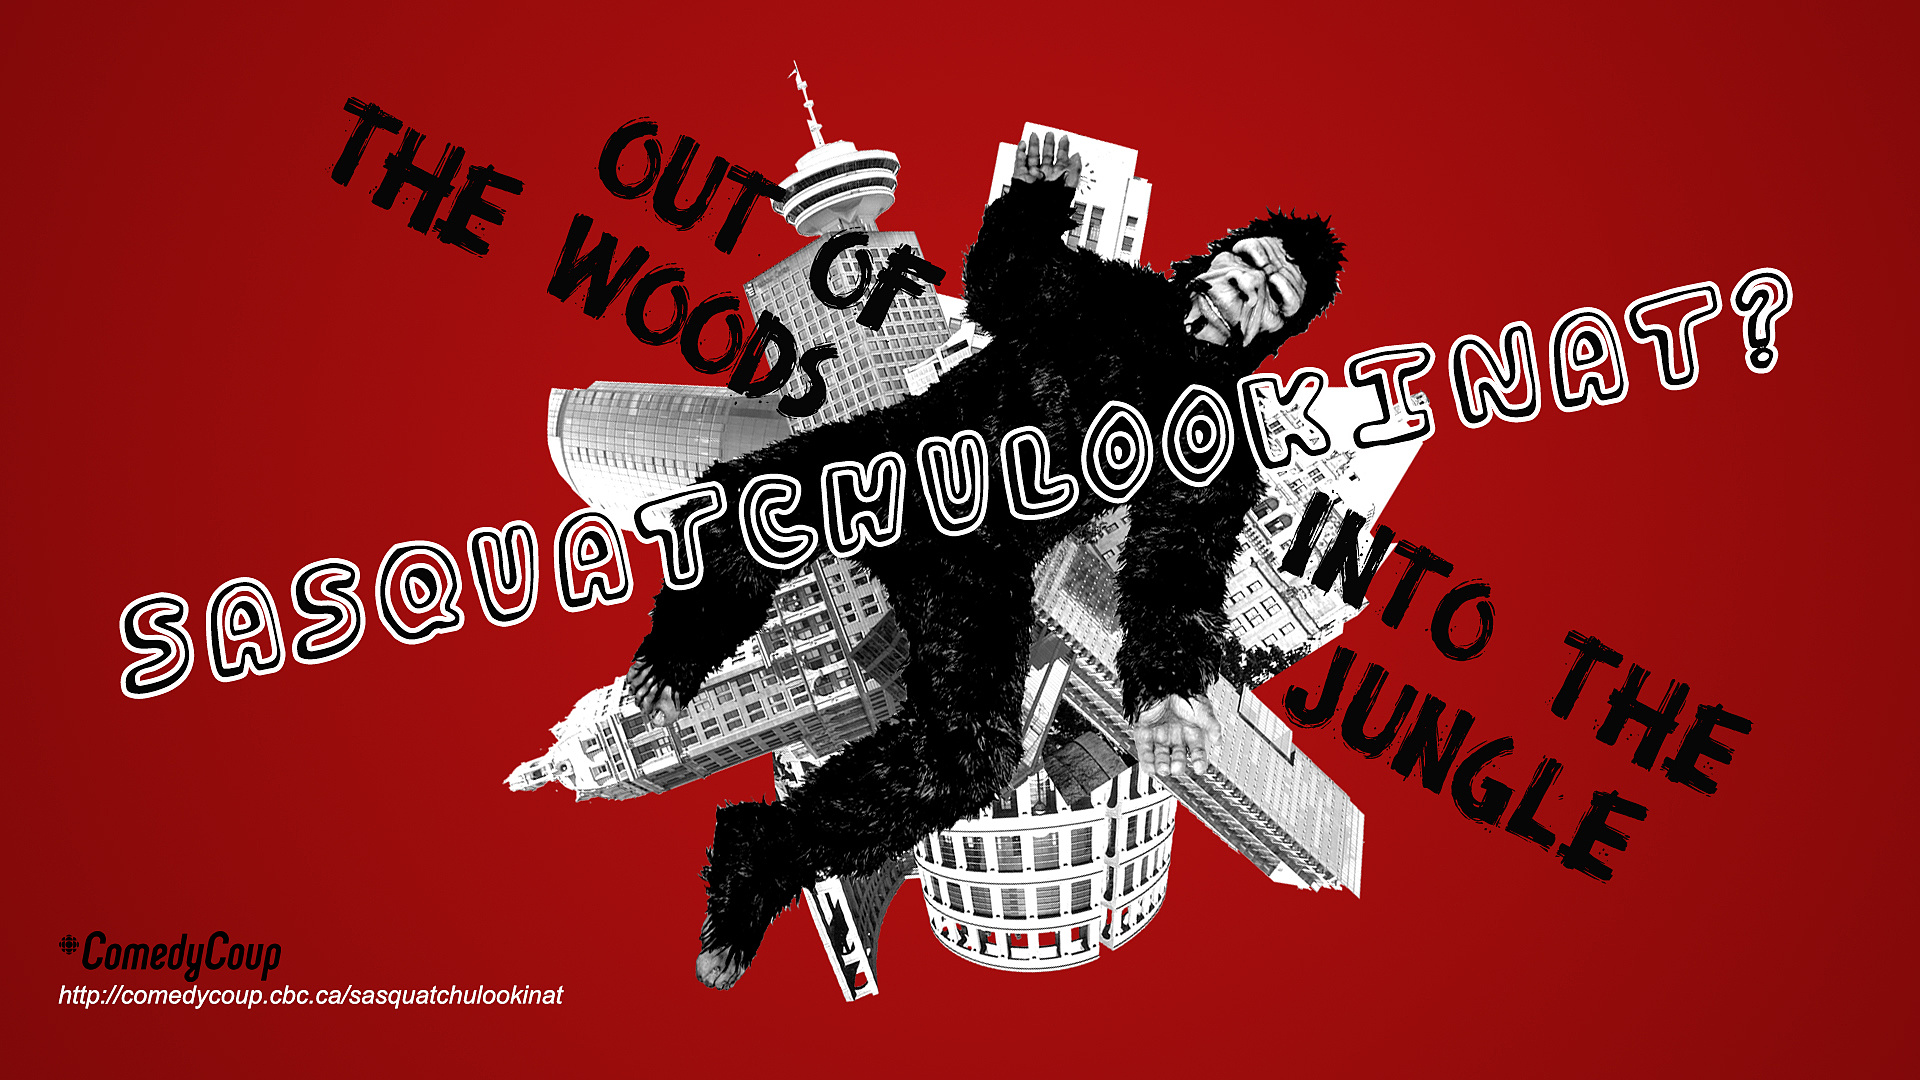 Week 4 Key It: Poster A Sasquatchulookinat?